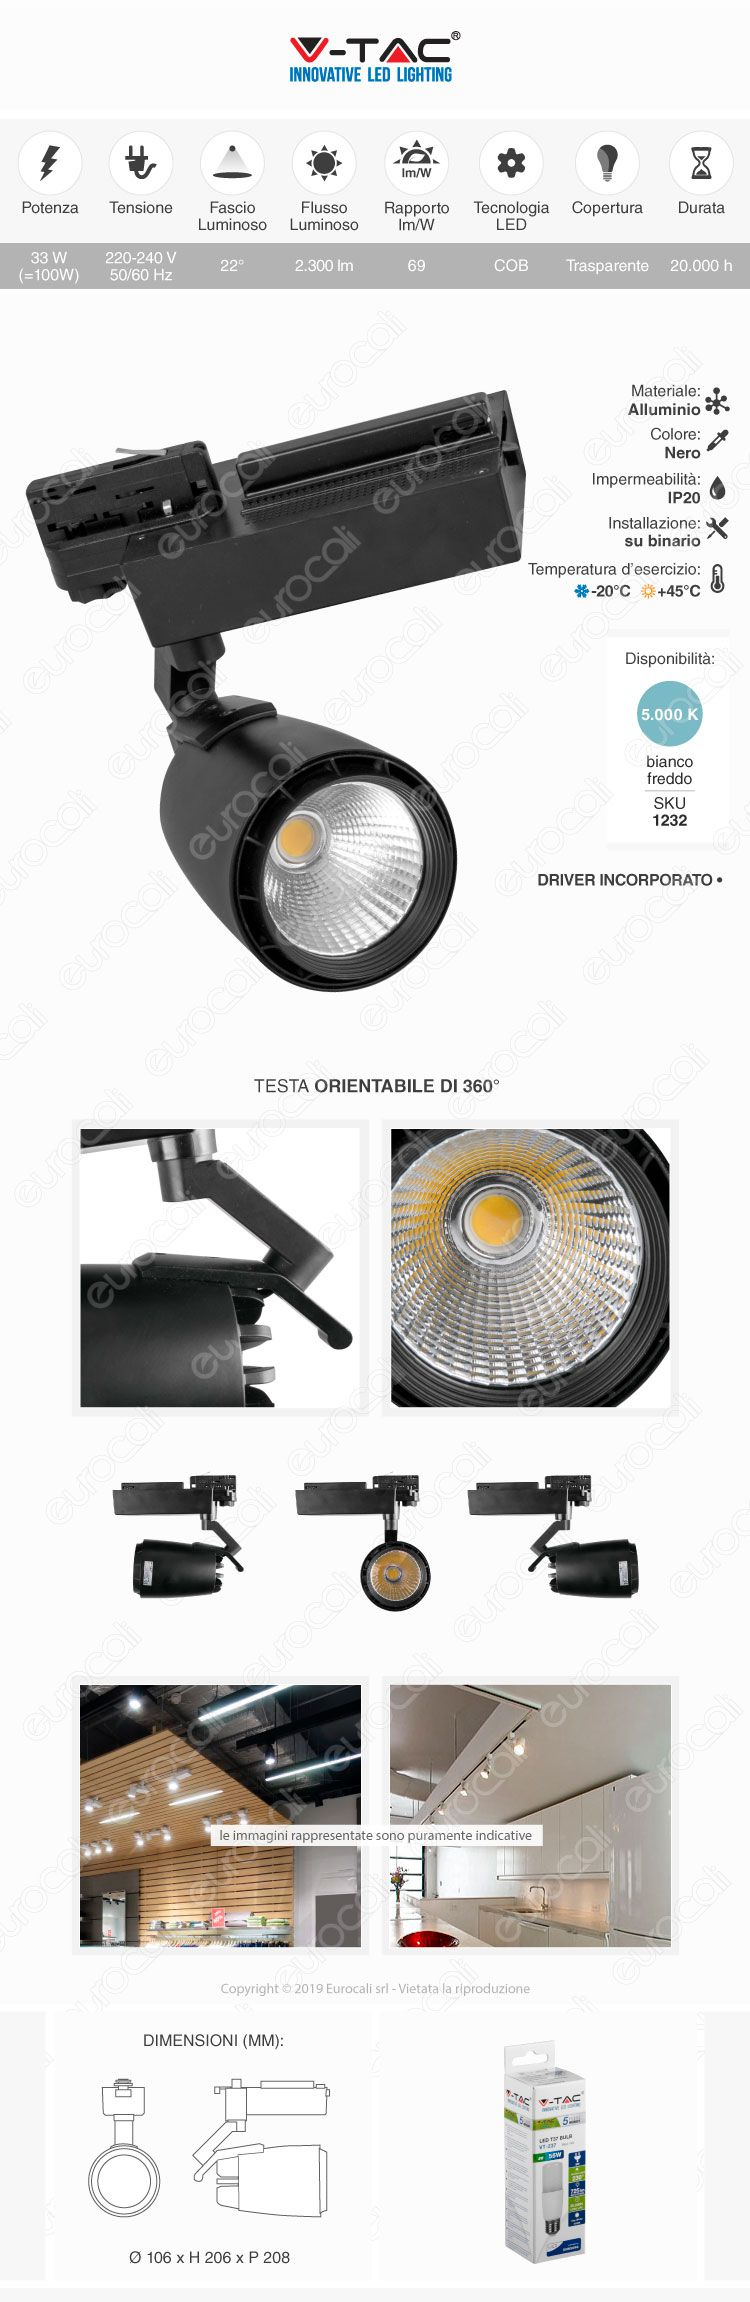 V-Tac VT-4534 Track Light LED COB 33W Colore Nero